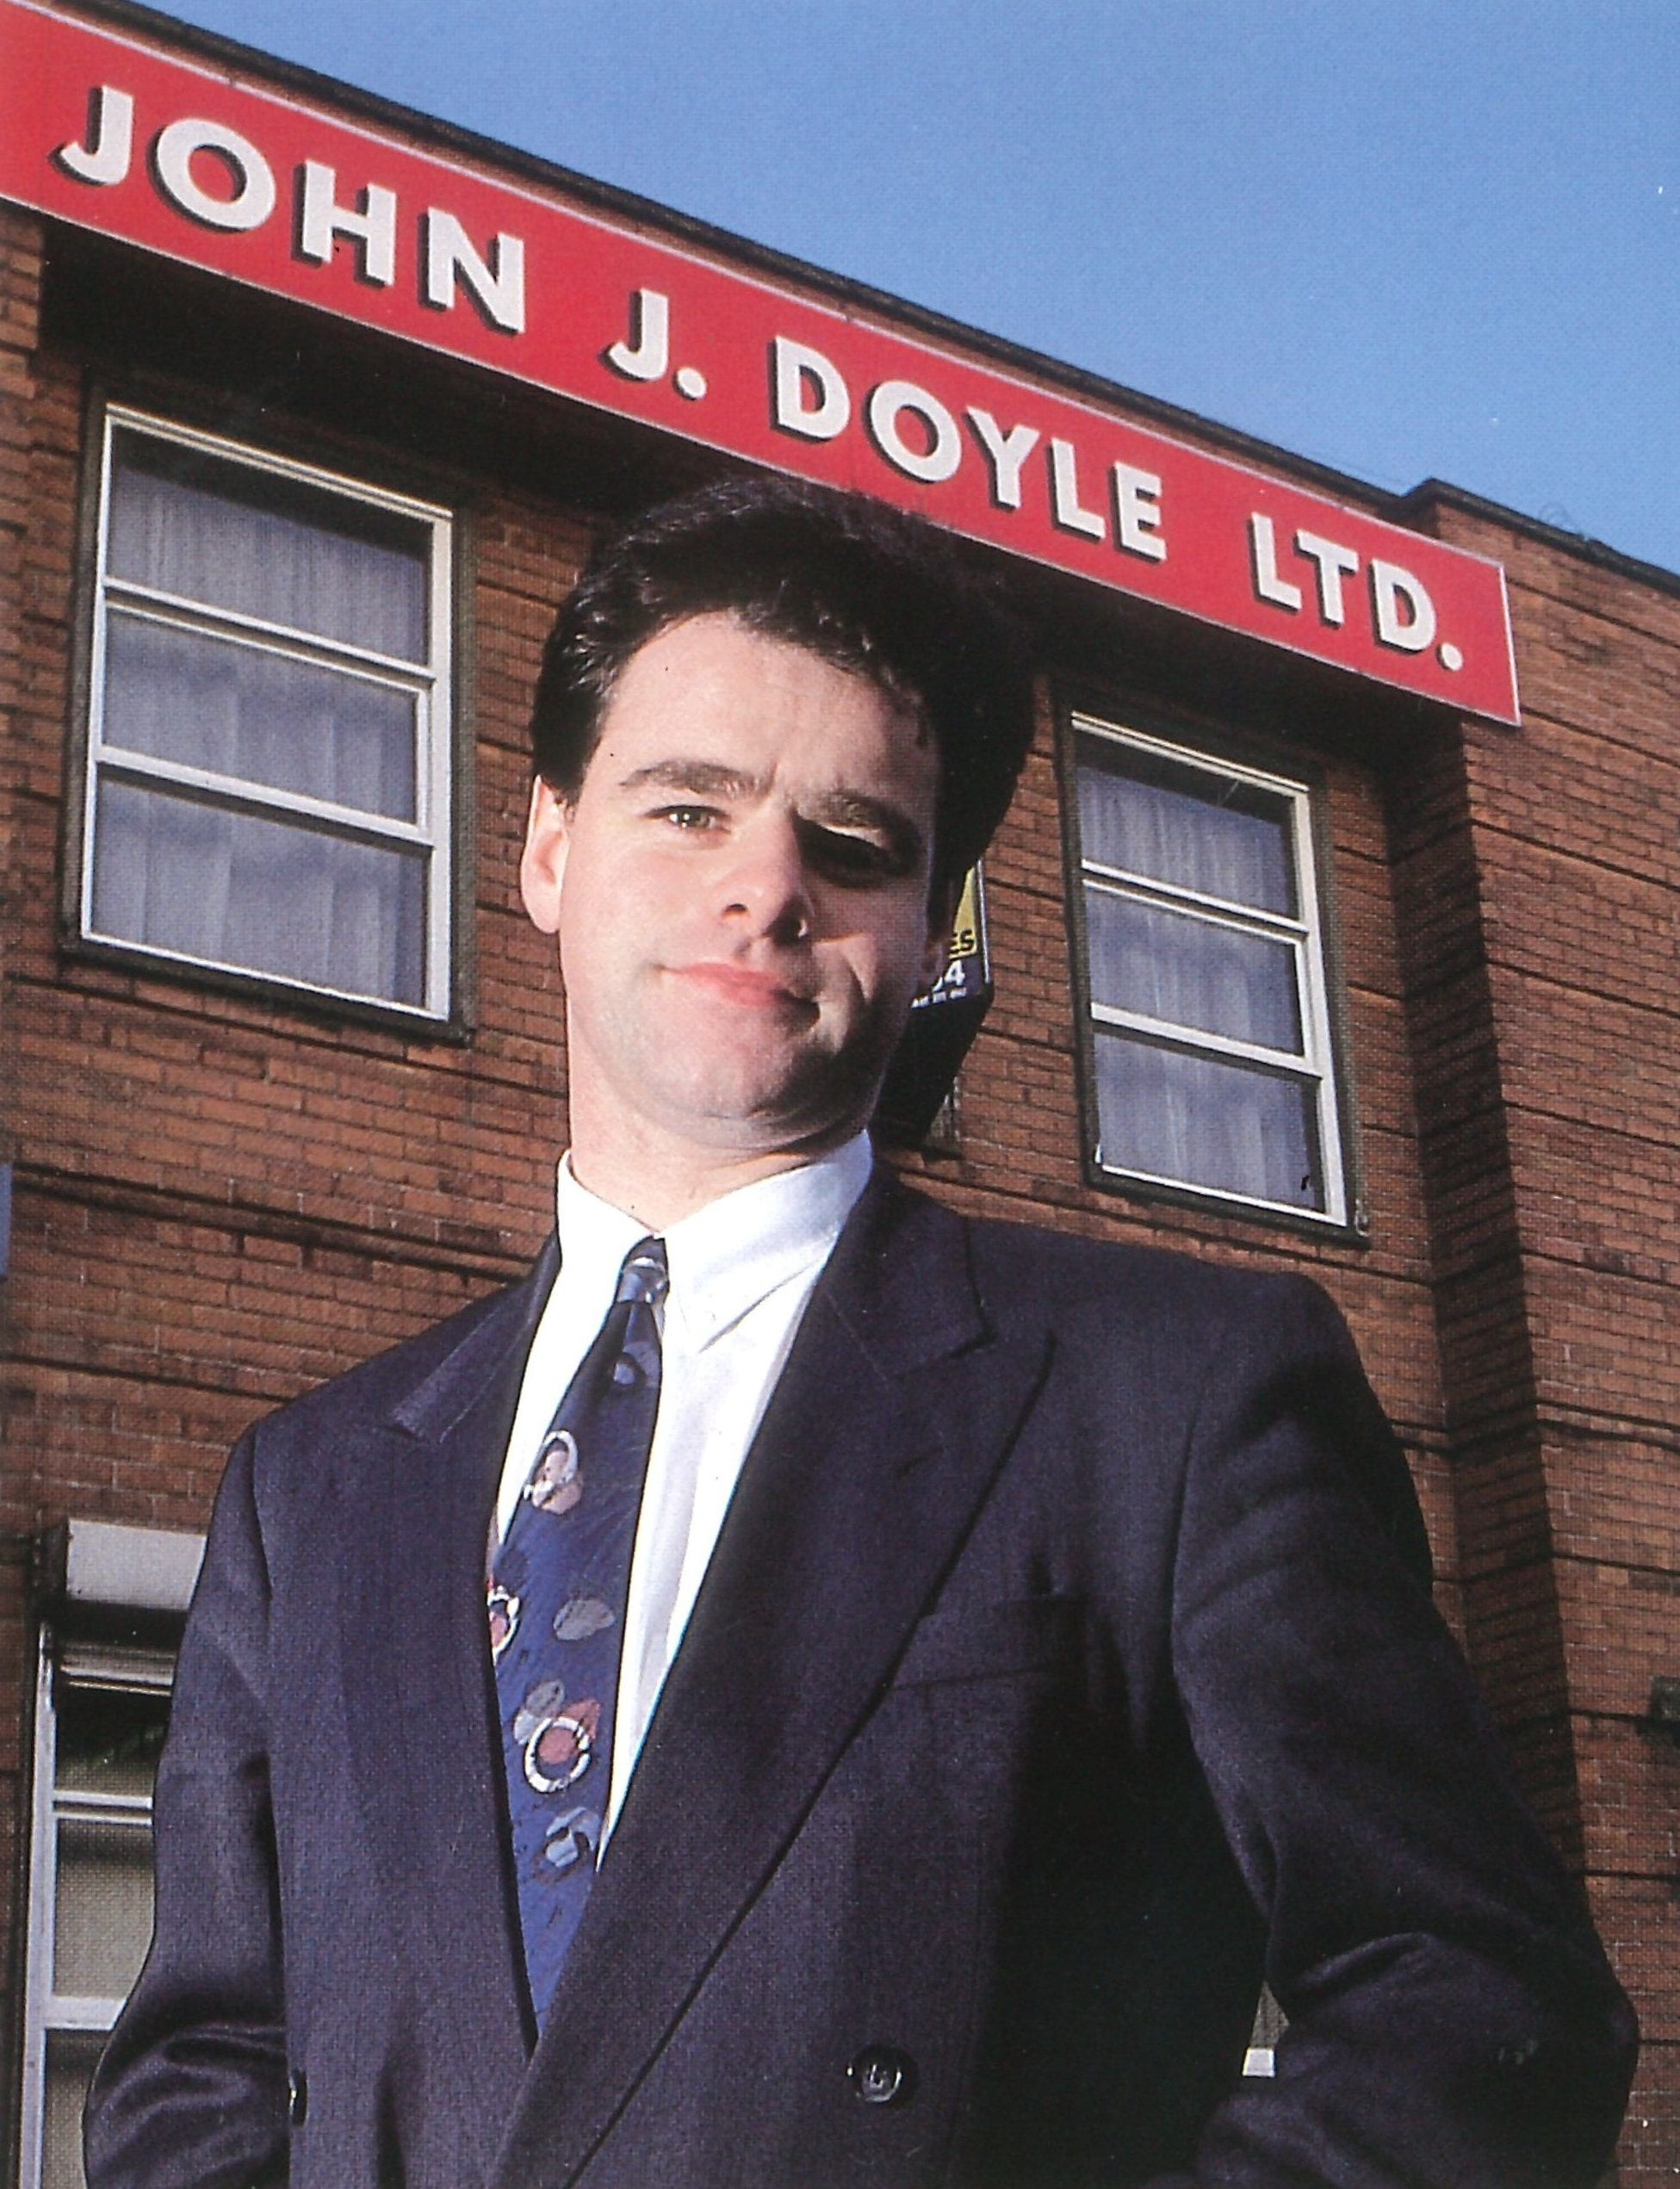 John J Doyle Ltd, 1987, Featured Image